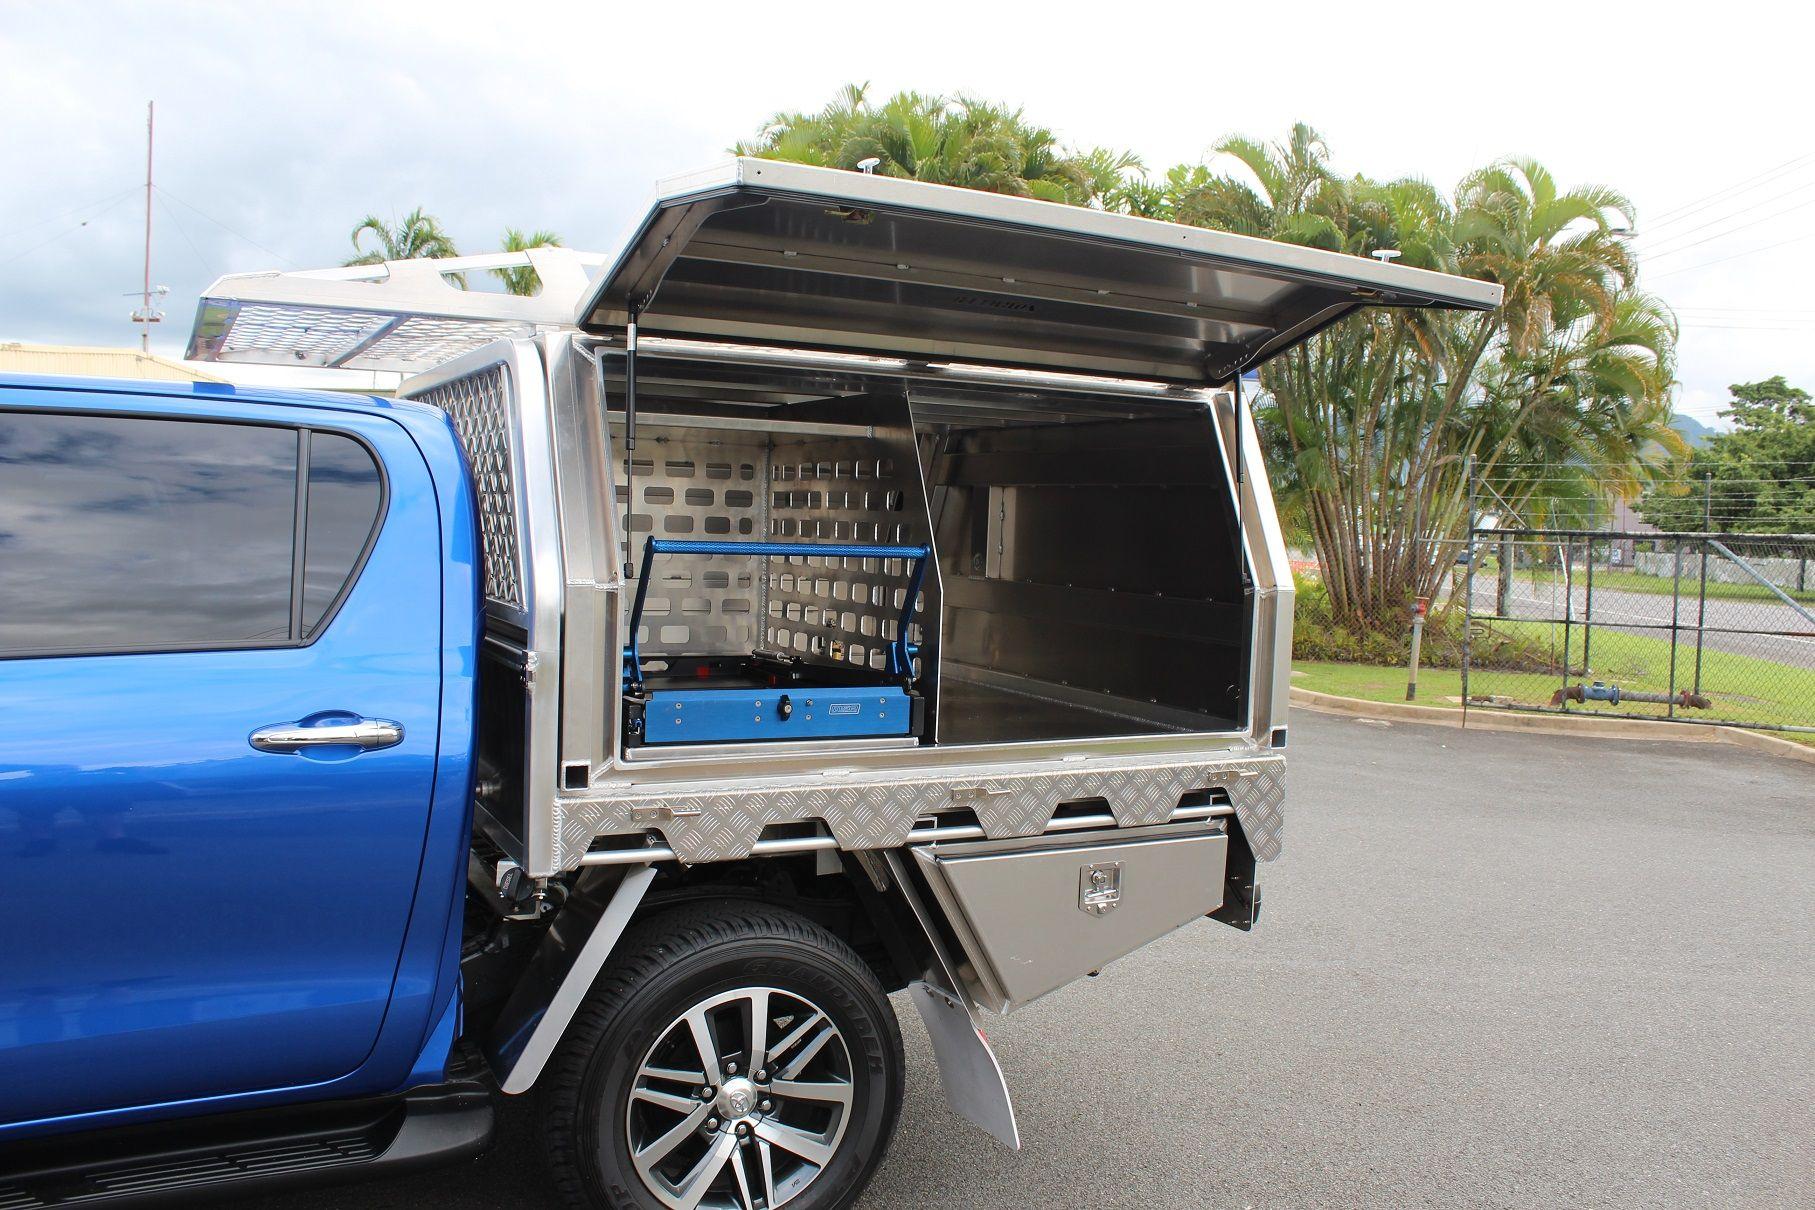 Toyota Hilux Aluminium Canopy & Toyota Hilux Aluminium Canopy | Slide on campers | Pinterest ...